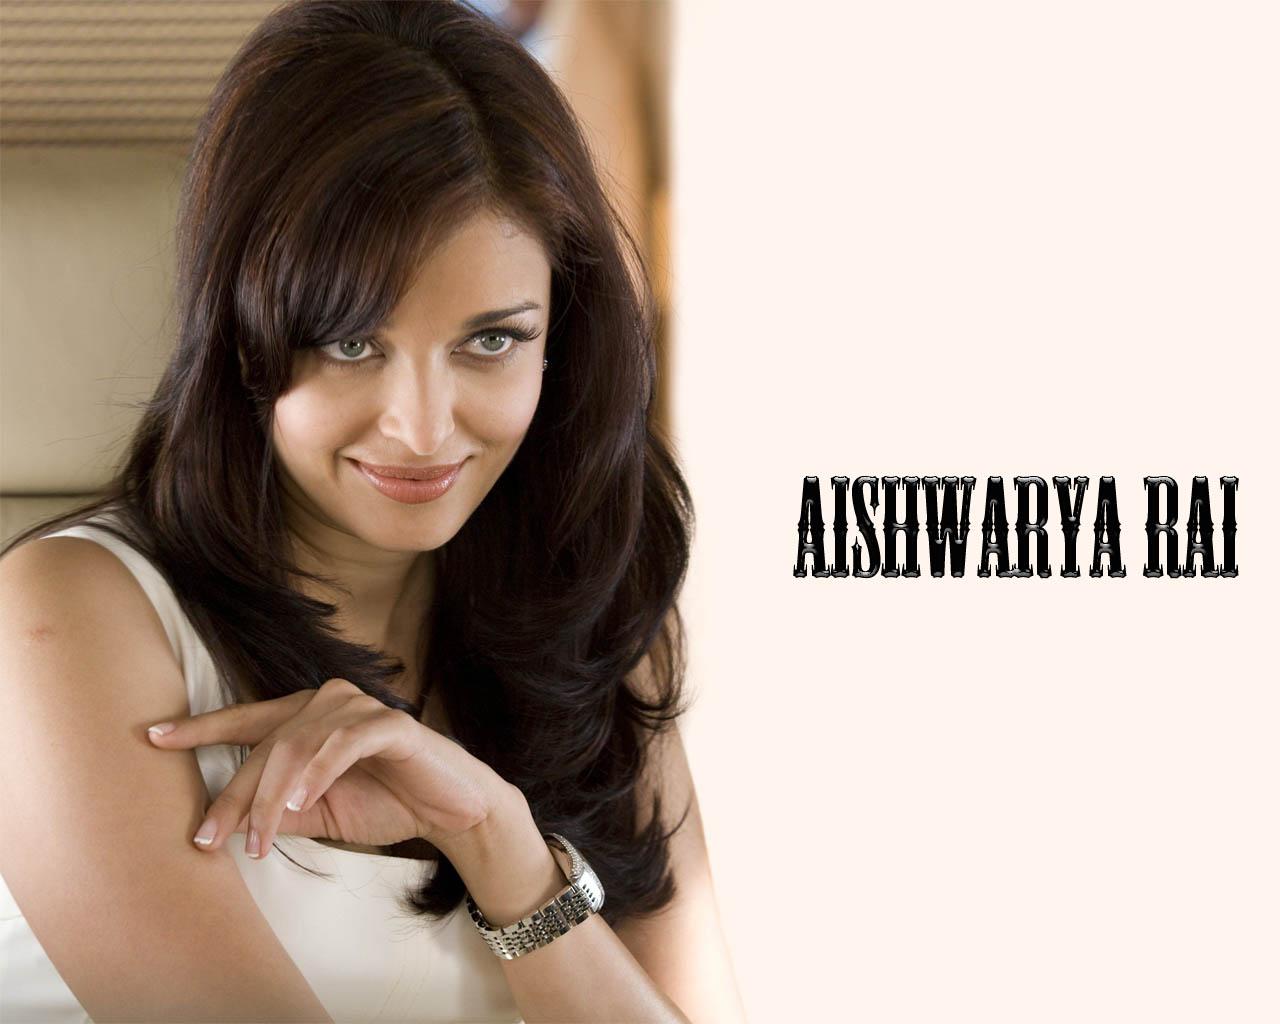 Aishwarya rai white dress image